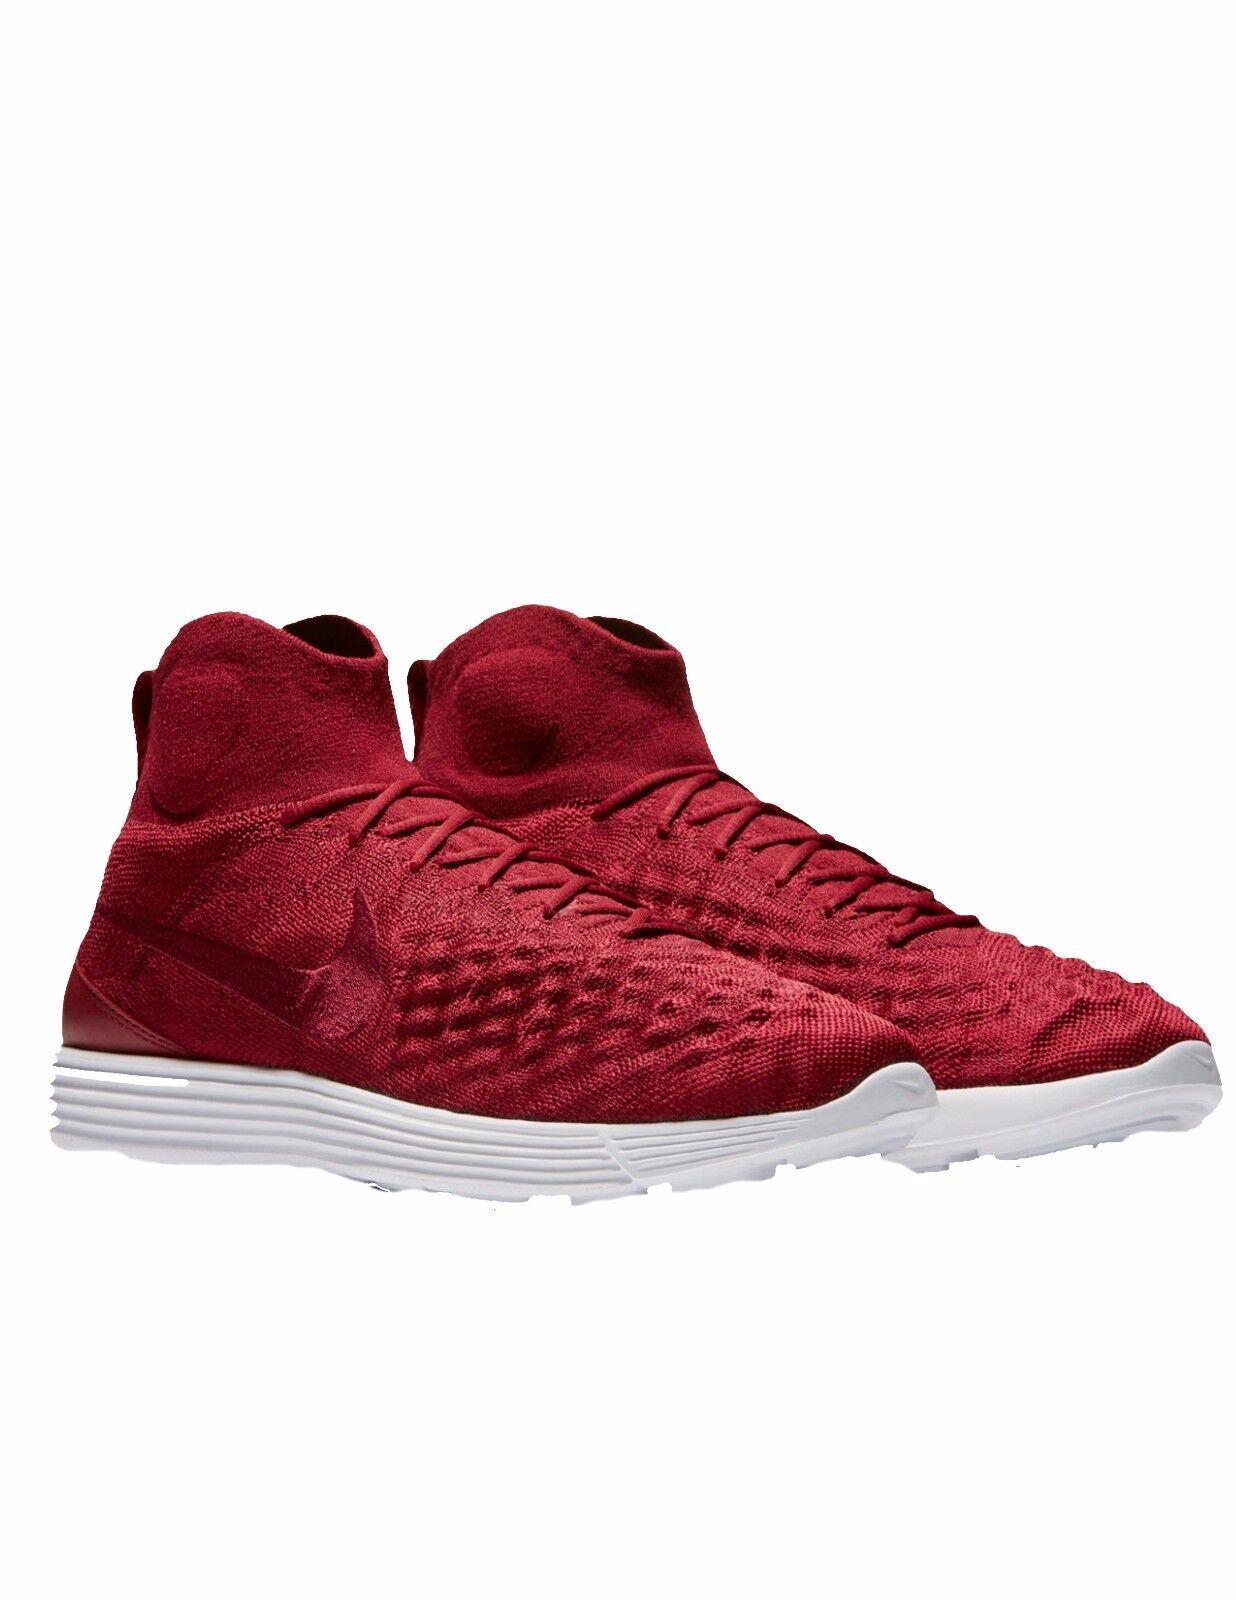 Nike Men's Lunar Magista II FK, TEAM RED TEAM RED-TEAM RED Size 9